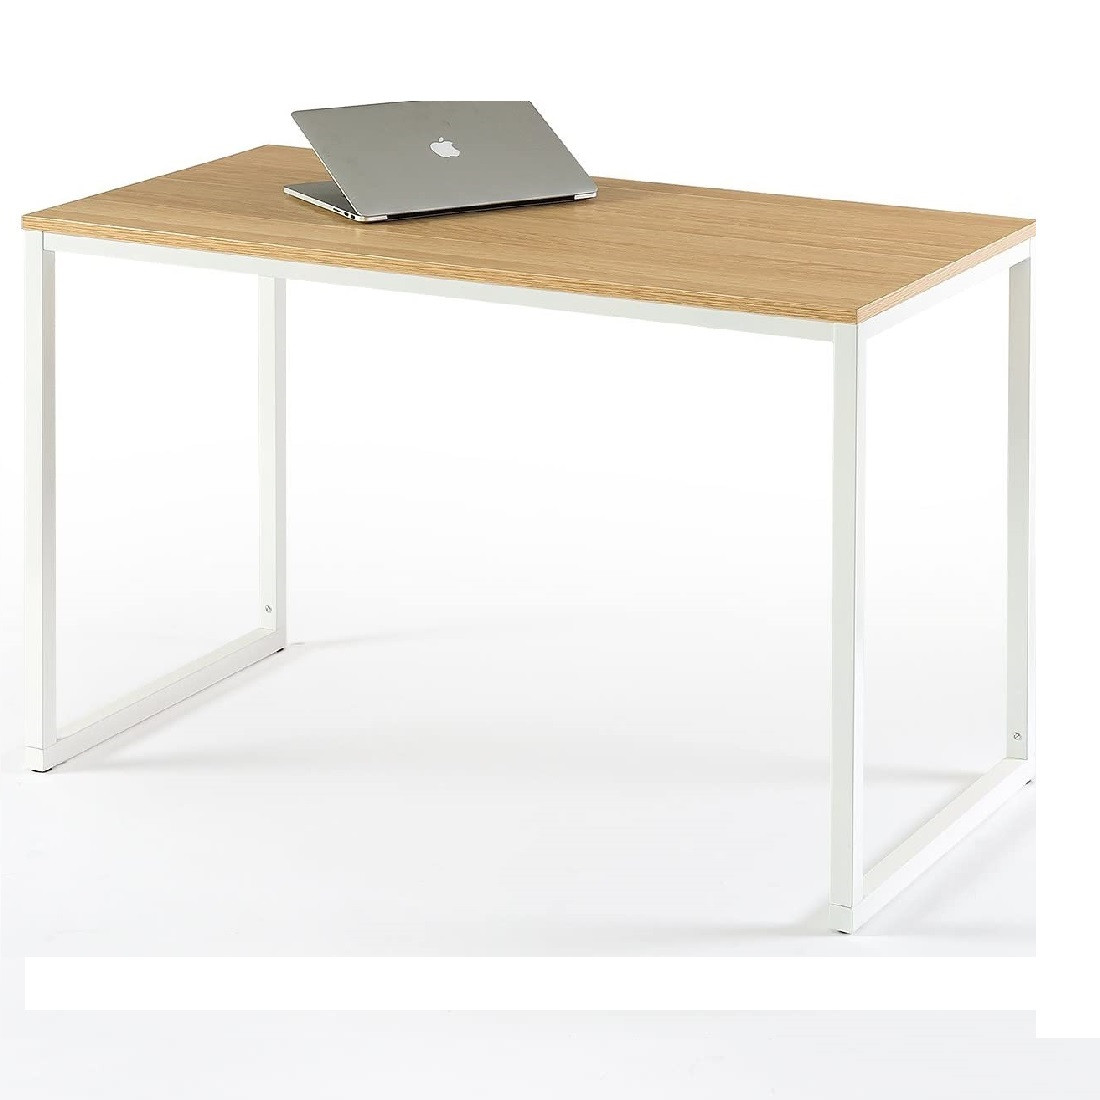 Стол письменный GoodsMetall из металла в стиле Лофт 1200х600х740 СП114